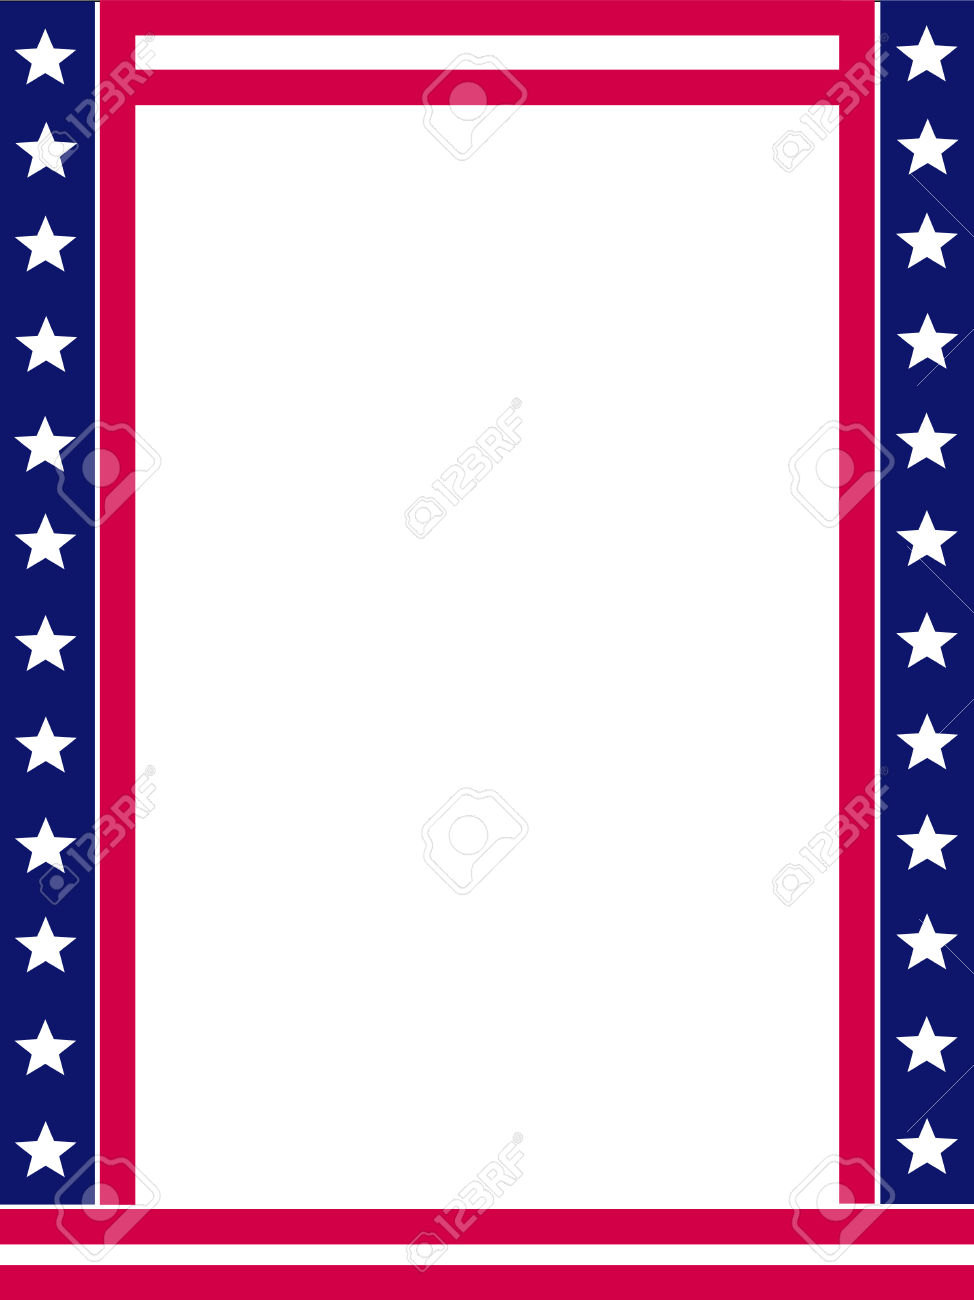 Patriotic Page Borders | Free download best Patriotic Page ...  Patriotic Page ...